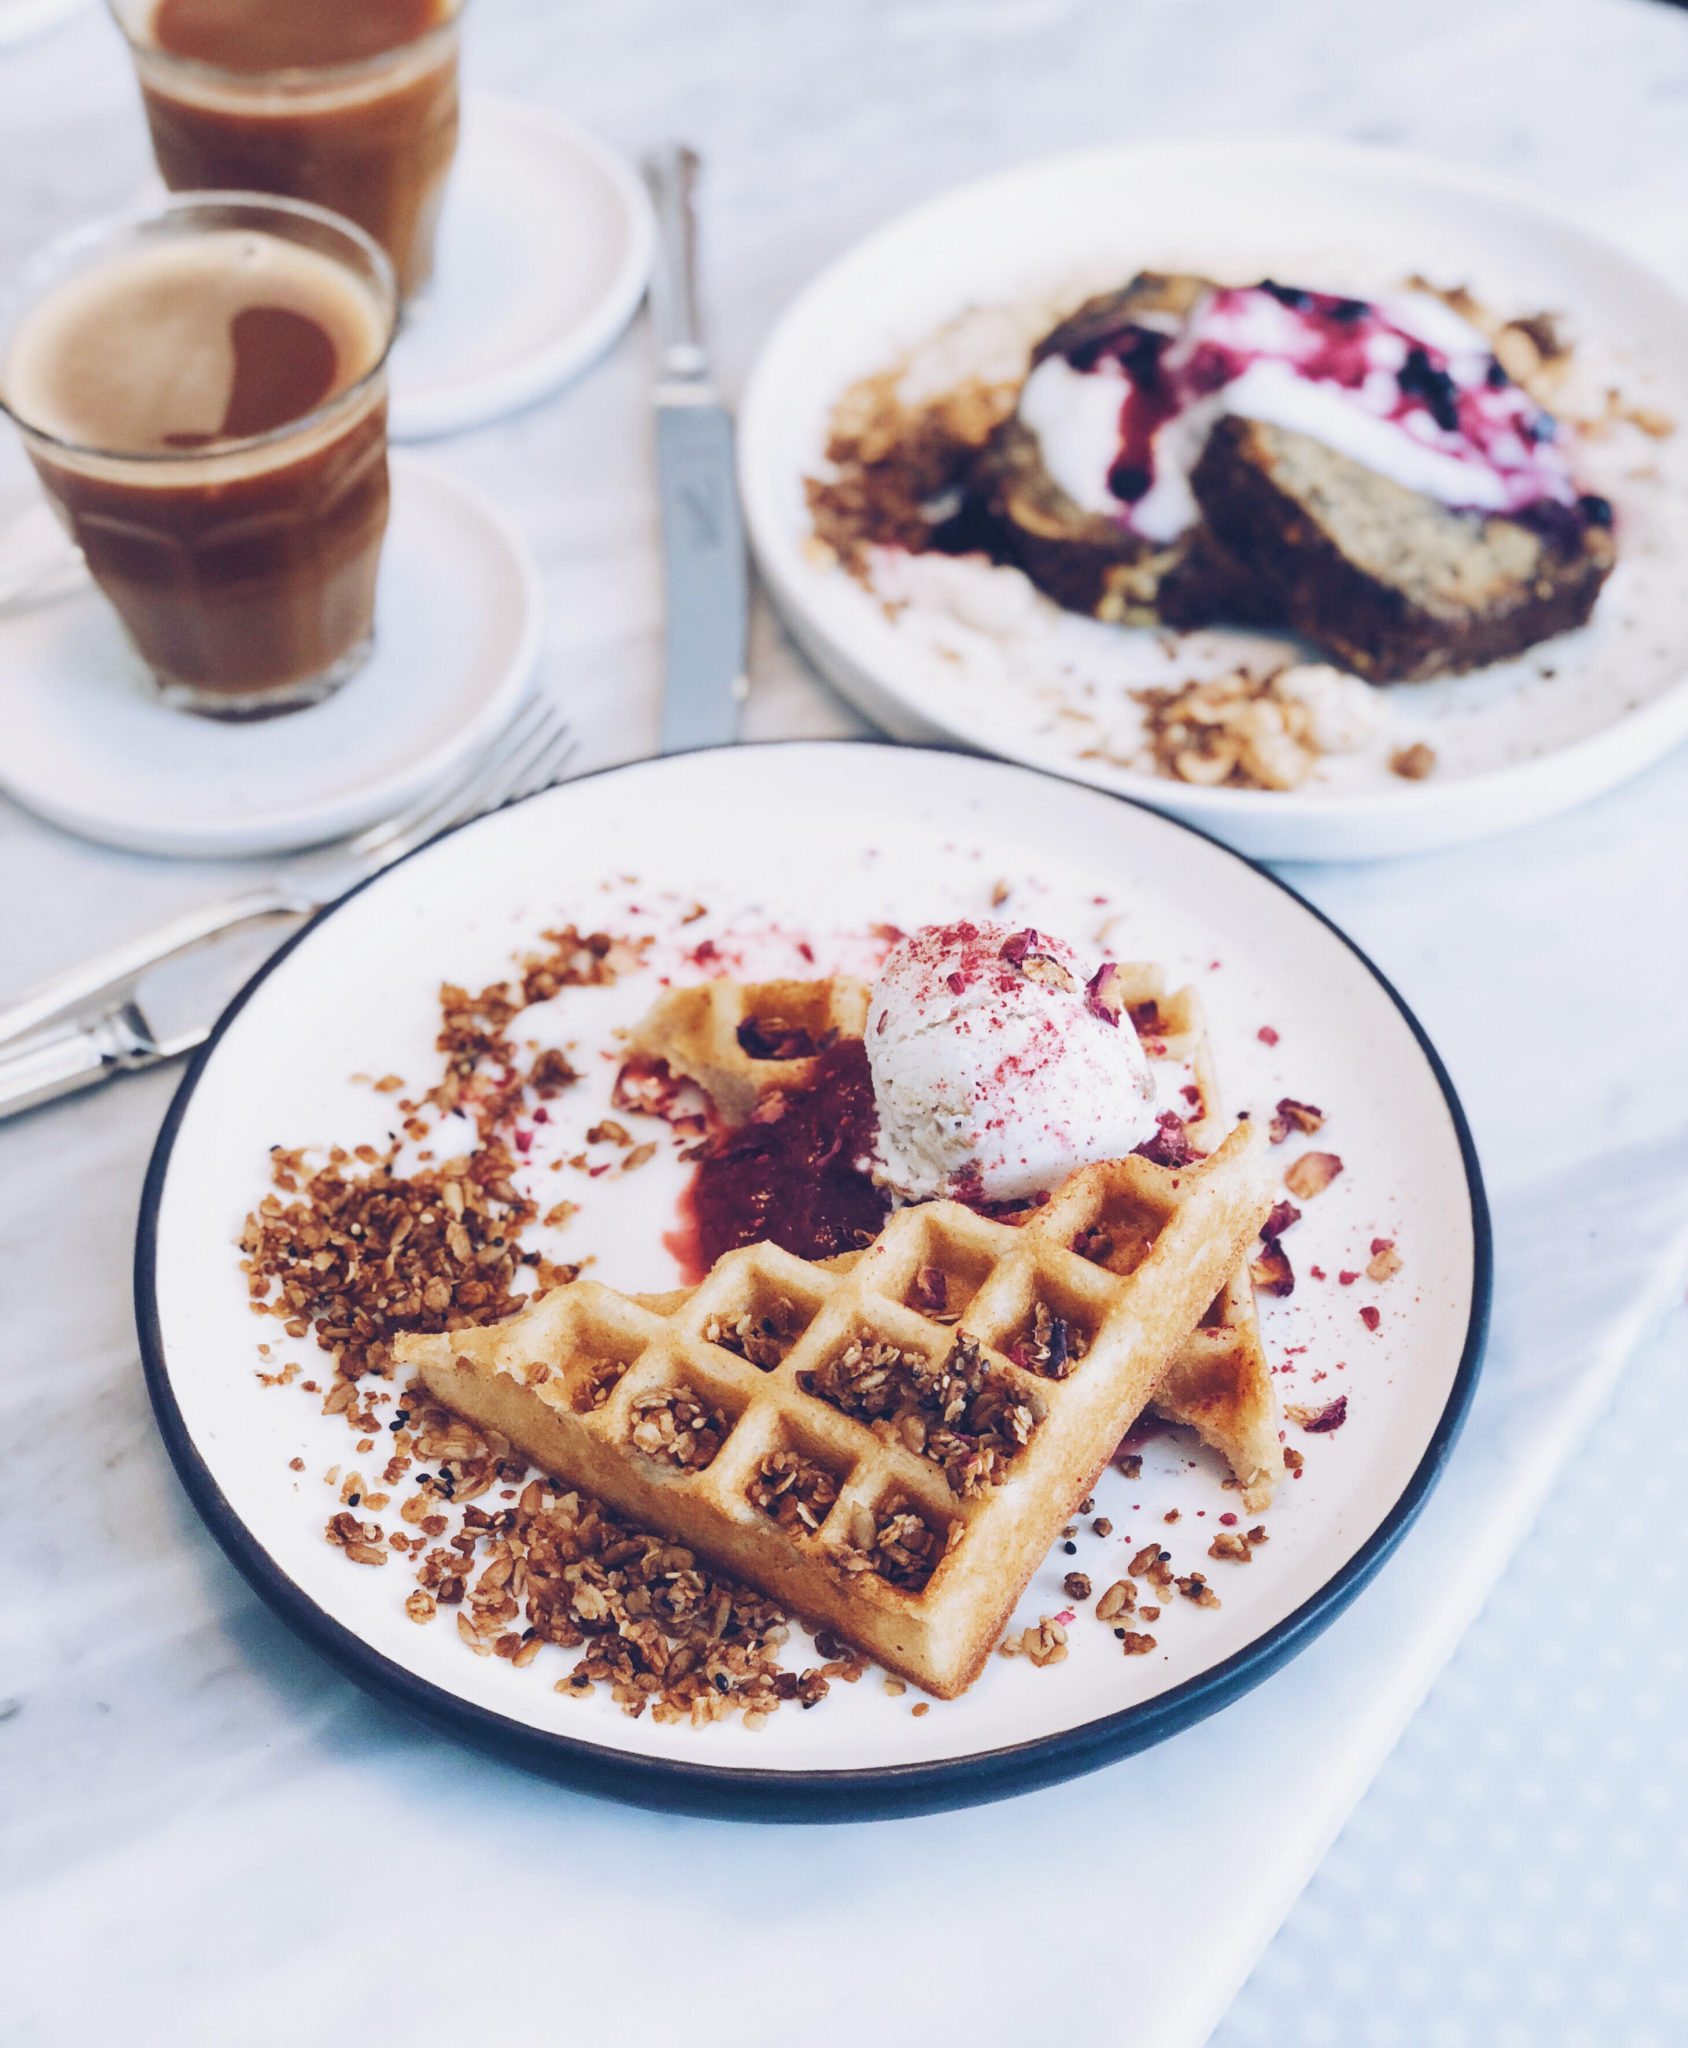 vegansk og sund morgenmad på Acacia